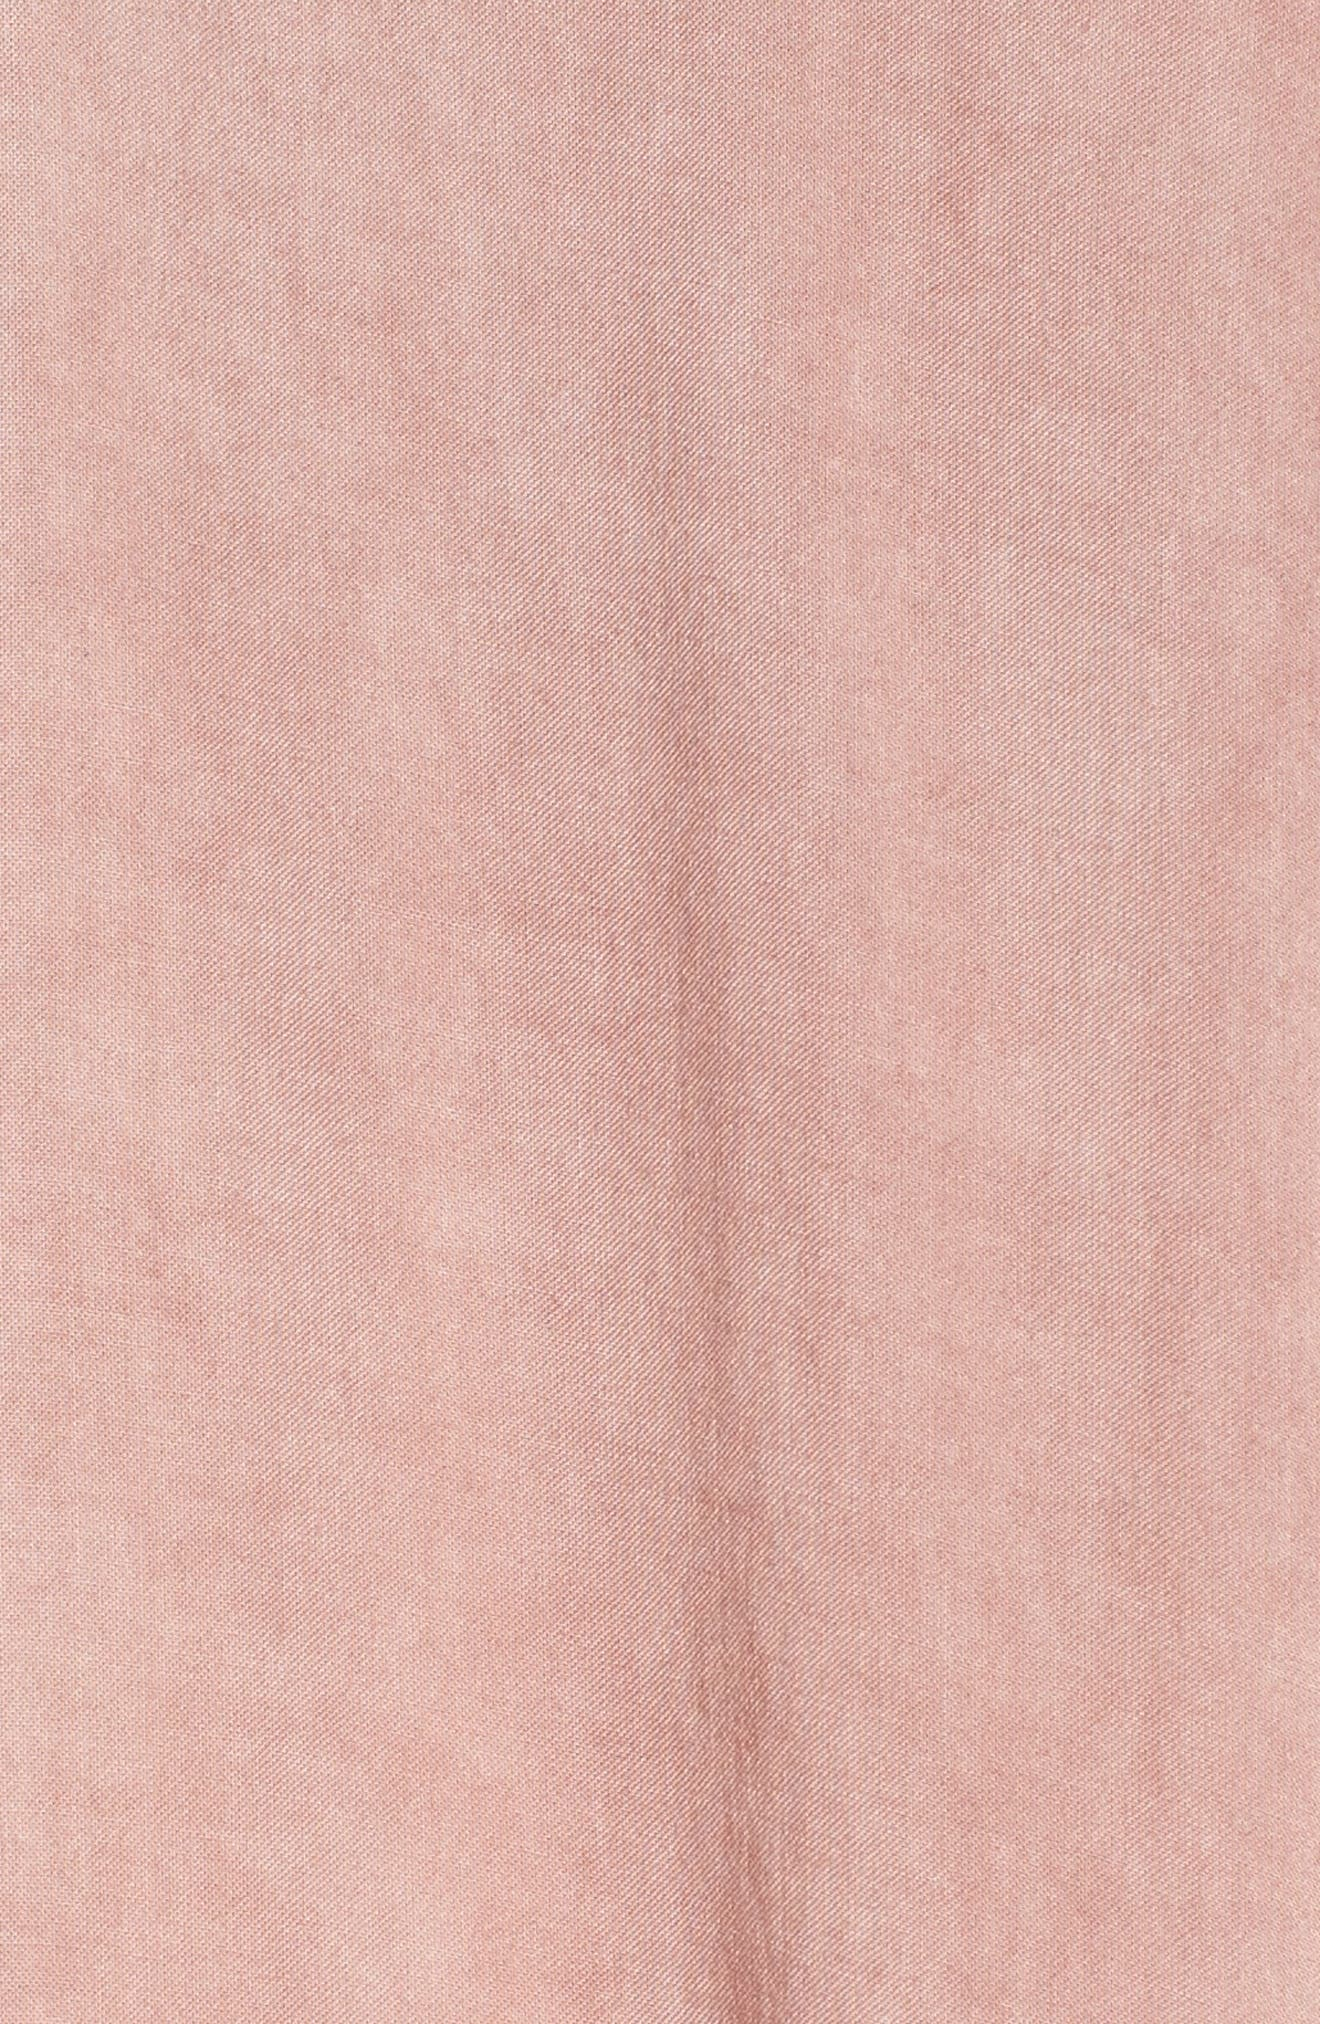 Cover-Up Maxi Dress,                             Alternate thumbnail 30, color,